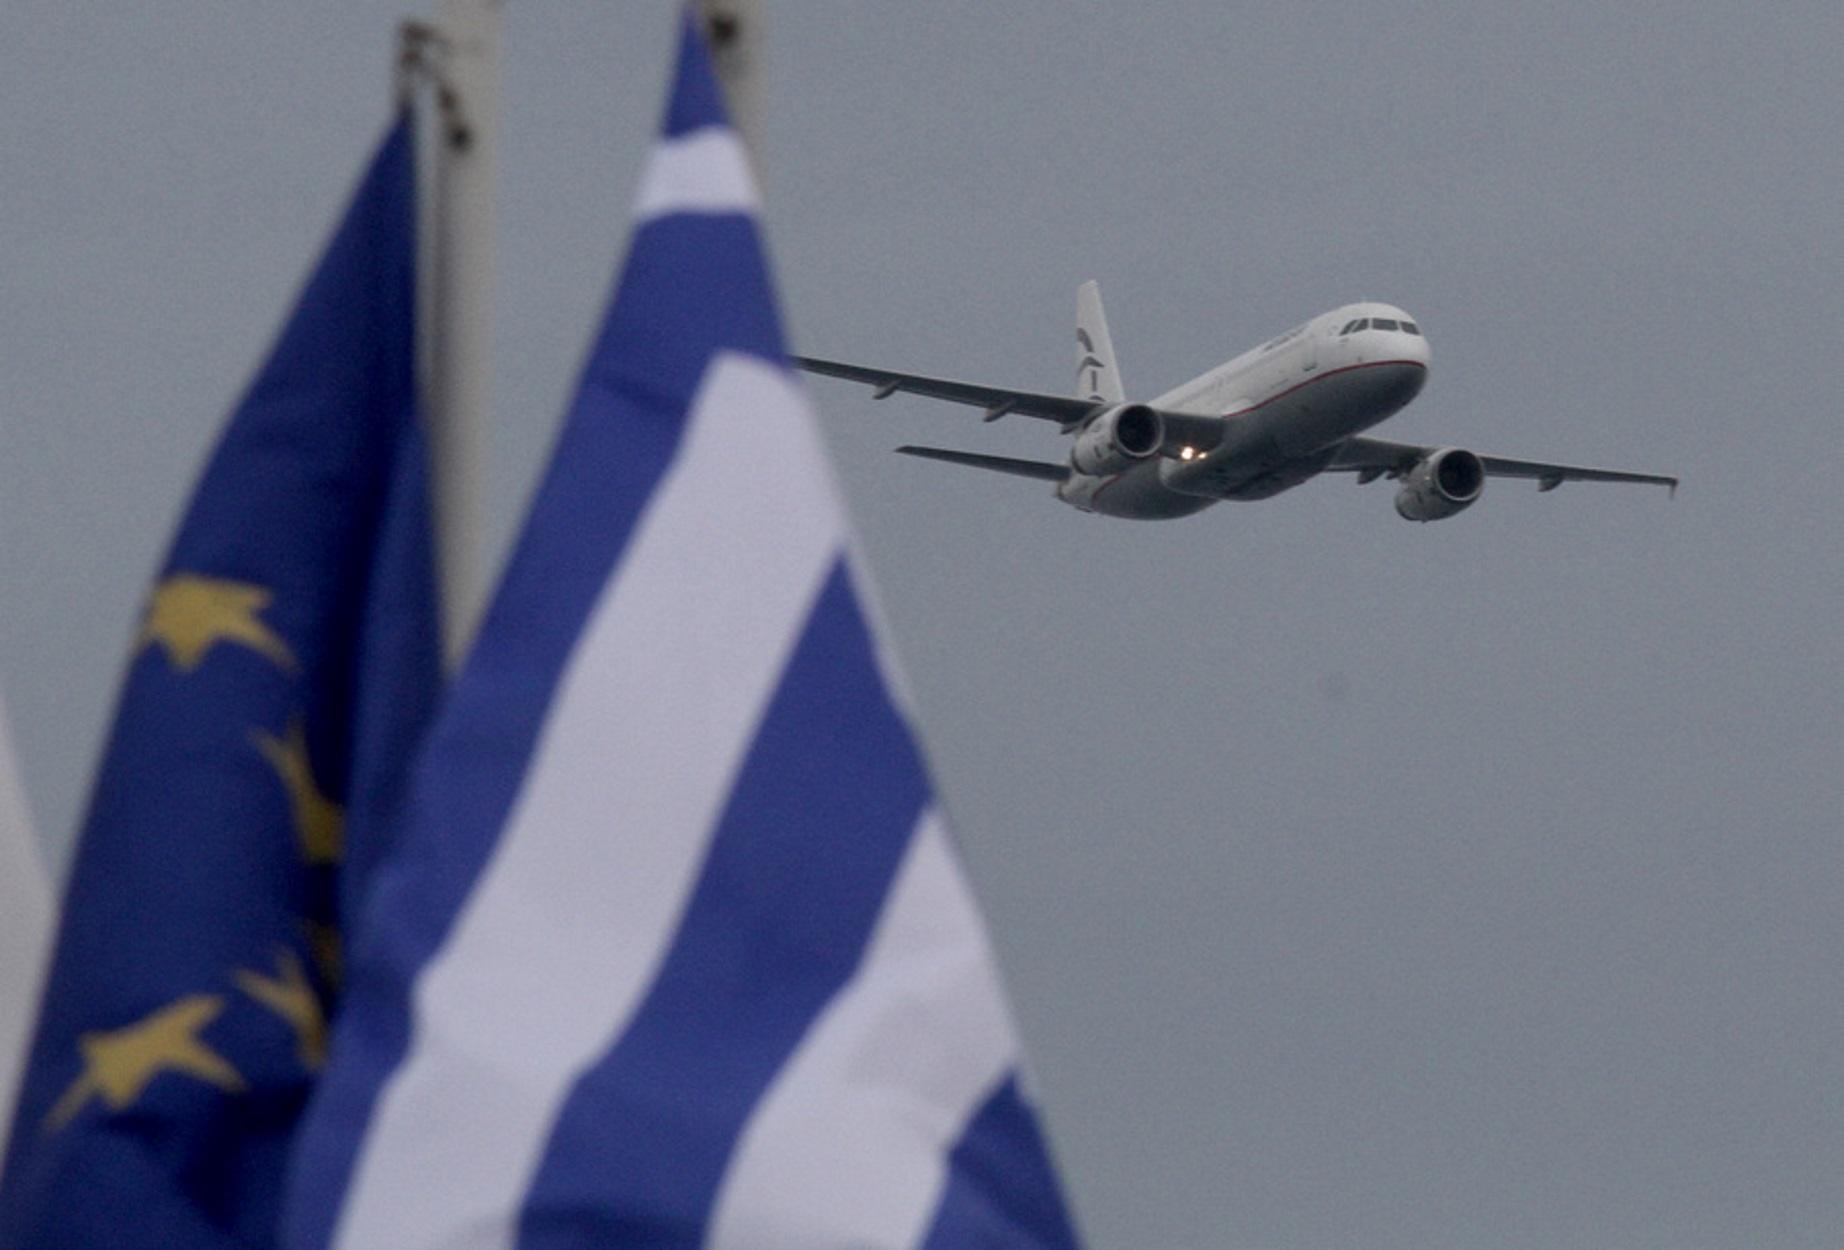 Aegean: Με θετικούς οιωνούς η τουριστική σεζόν – Αυξημένες κρατήσεις εισιτηρίων για τον Ιούλιο